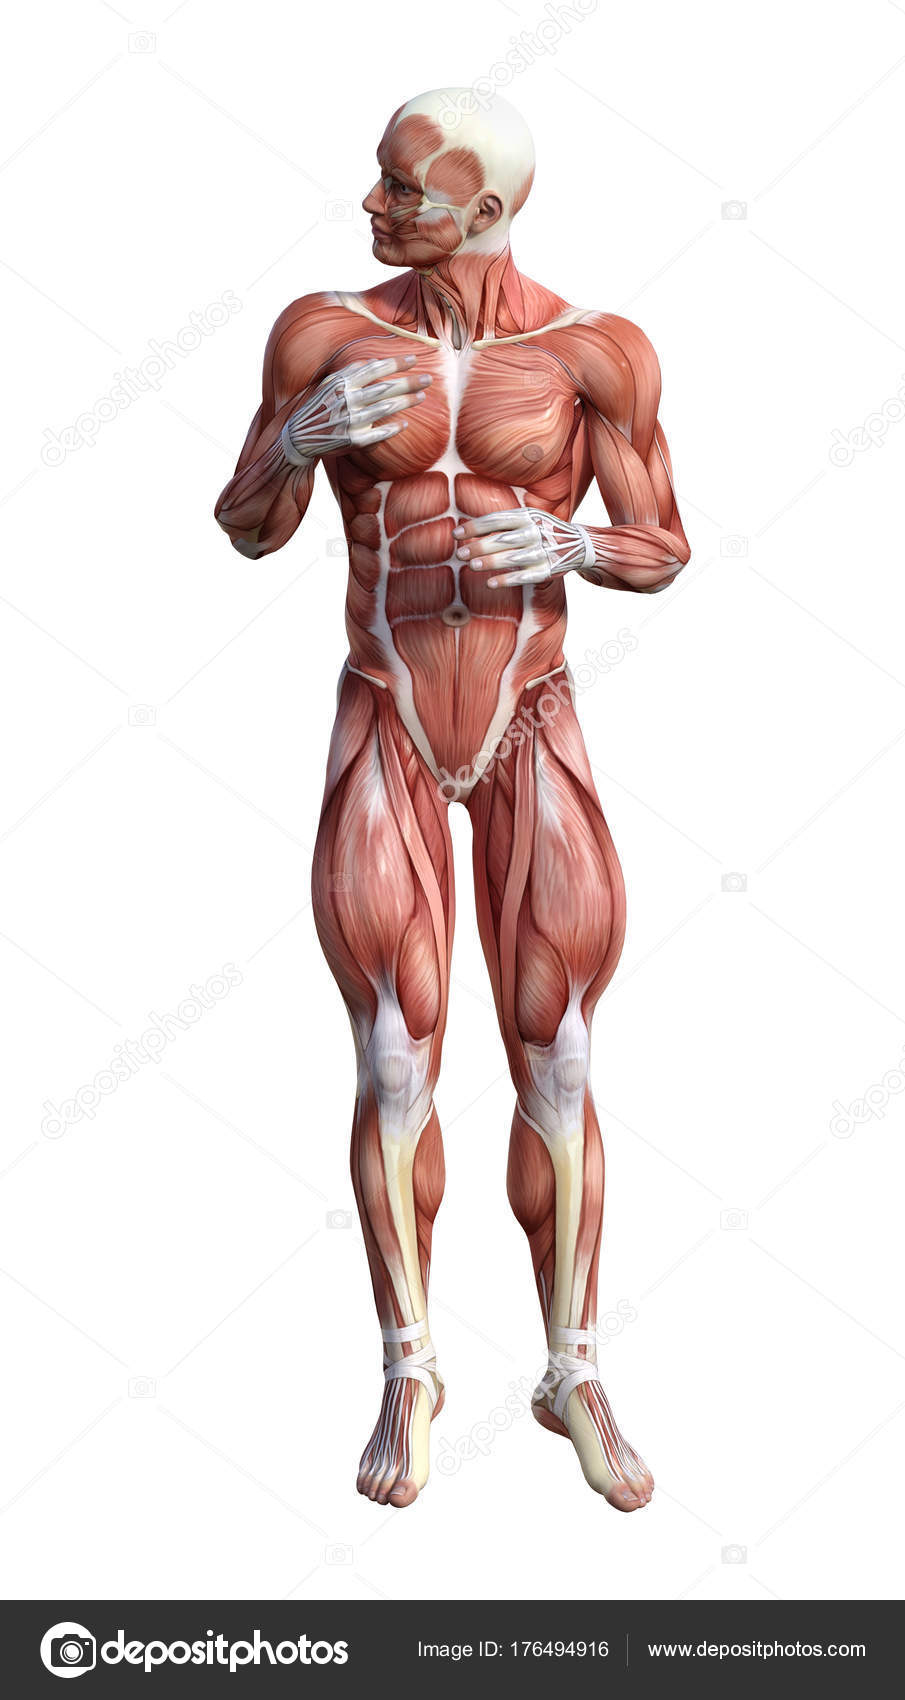 Tolle Anatomie In 3d Bilder - Anatomie Ideen - finotti.info